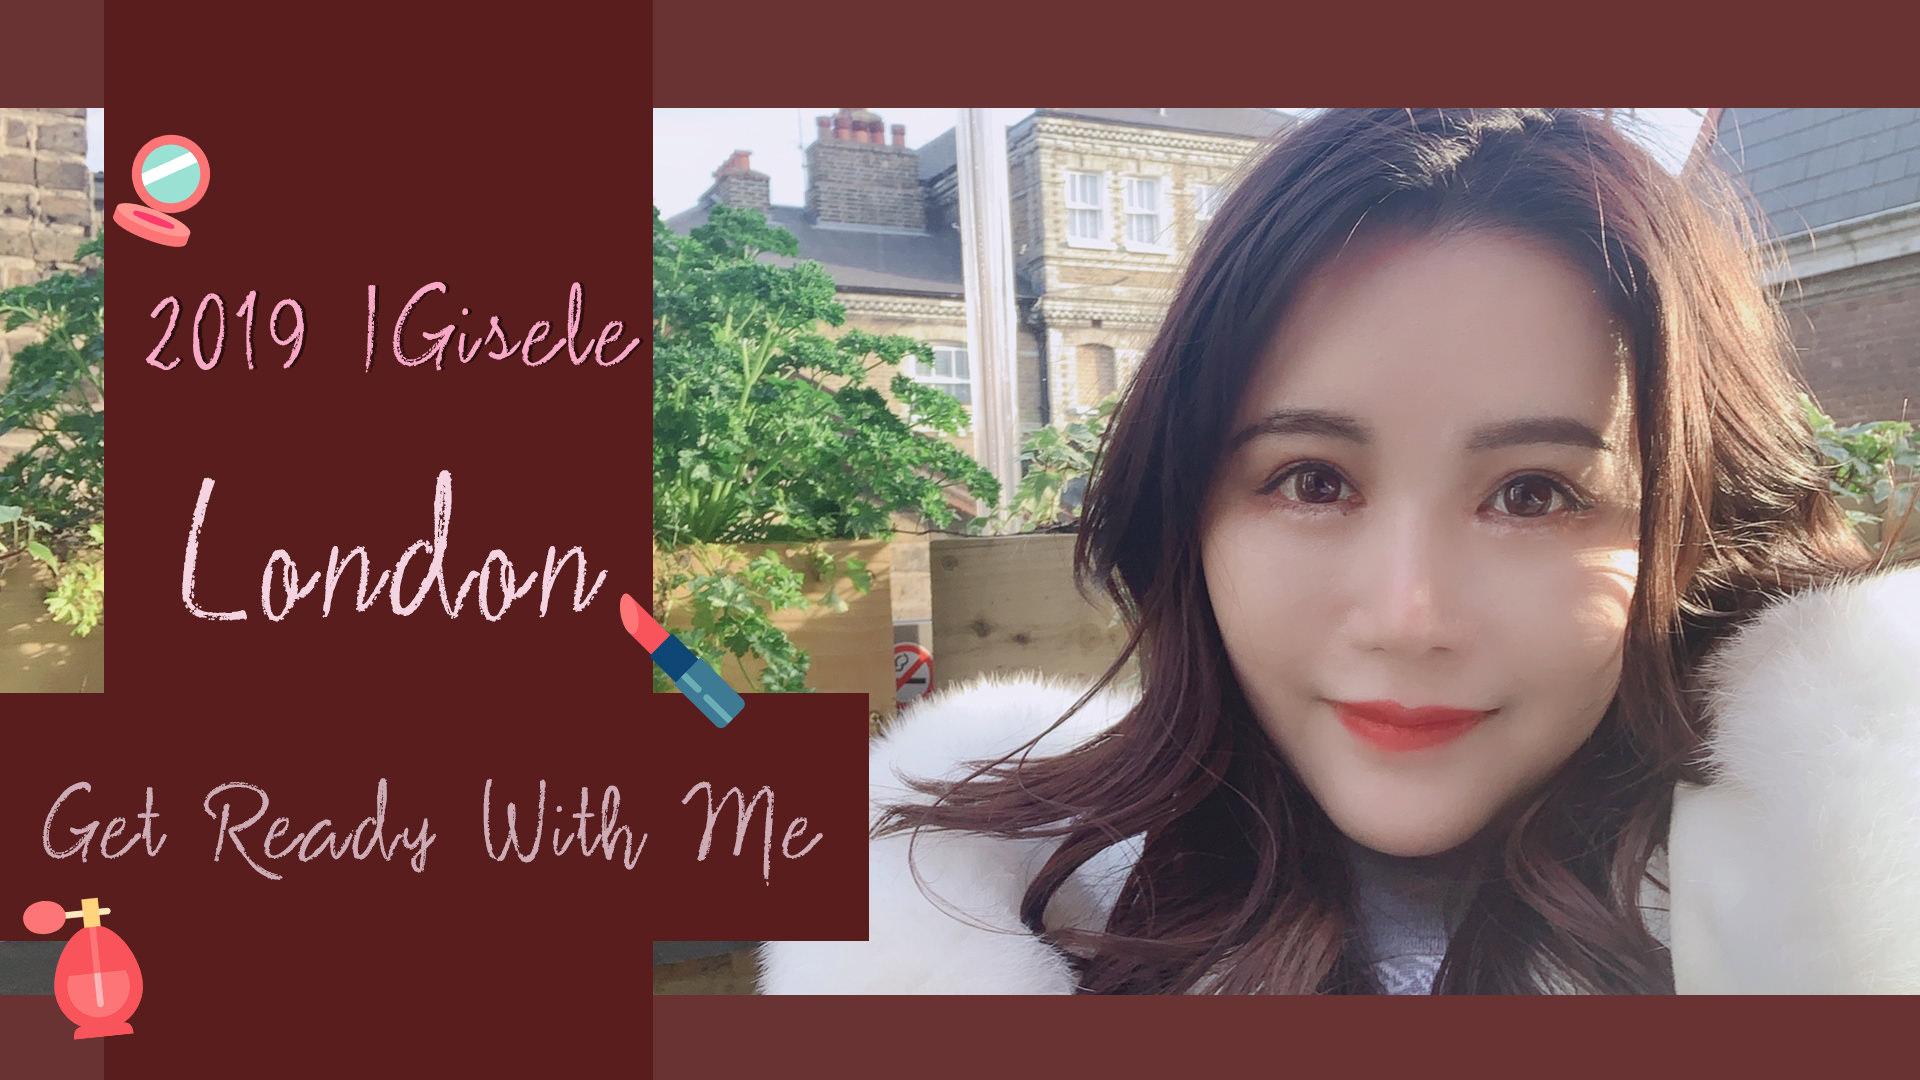 [YOUTUBE] GRAM 倫敦之旅的簡單乾淨秋天妝容 get ready with me! | IGisele